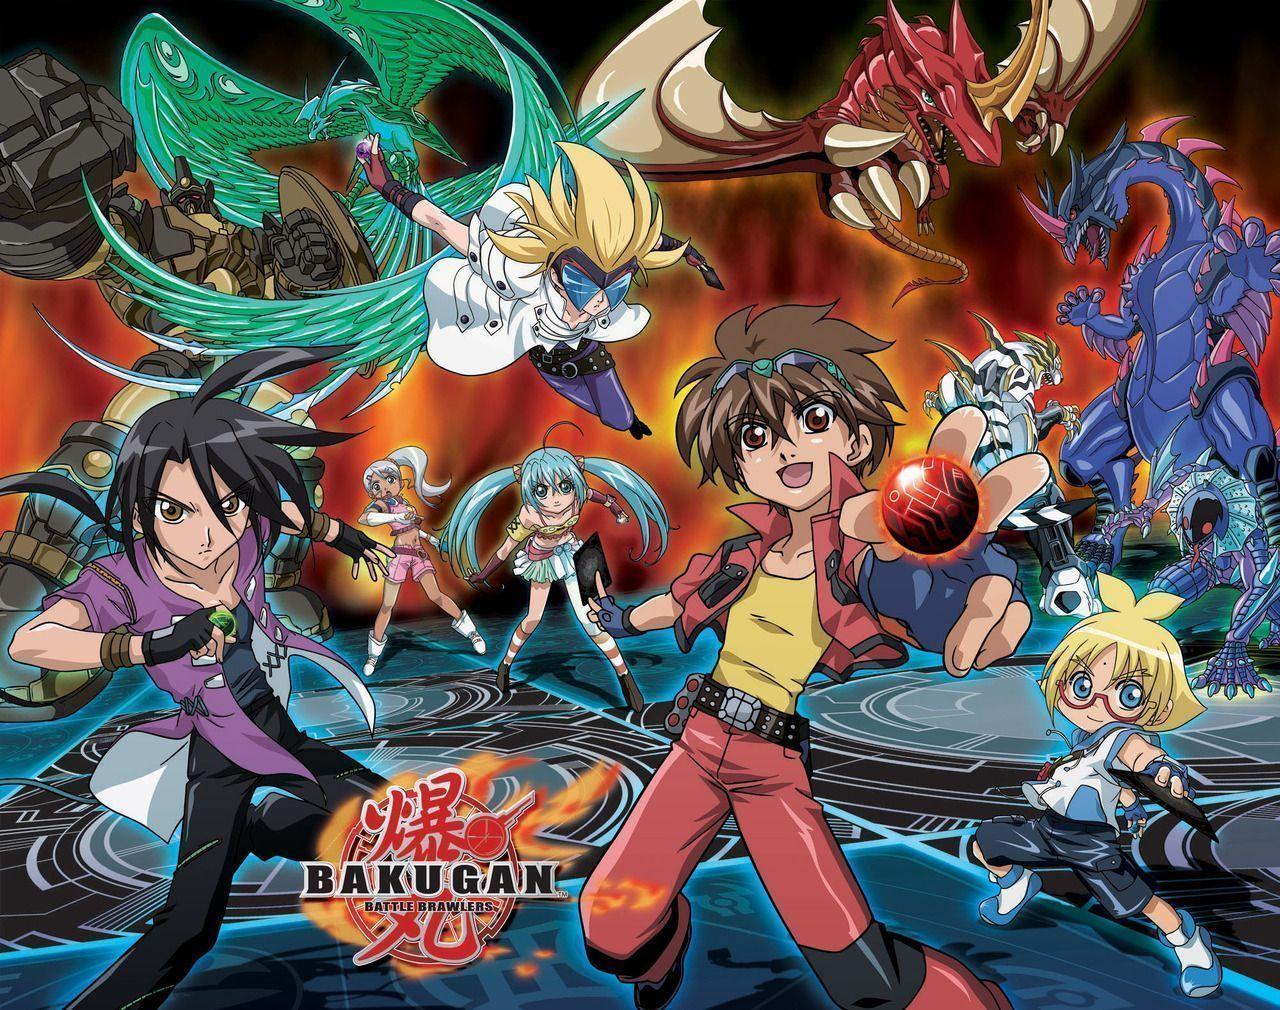 Bakugan - Bakugan saison 4 ...